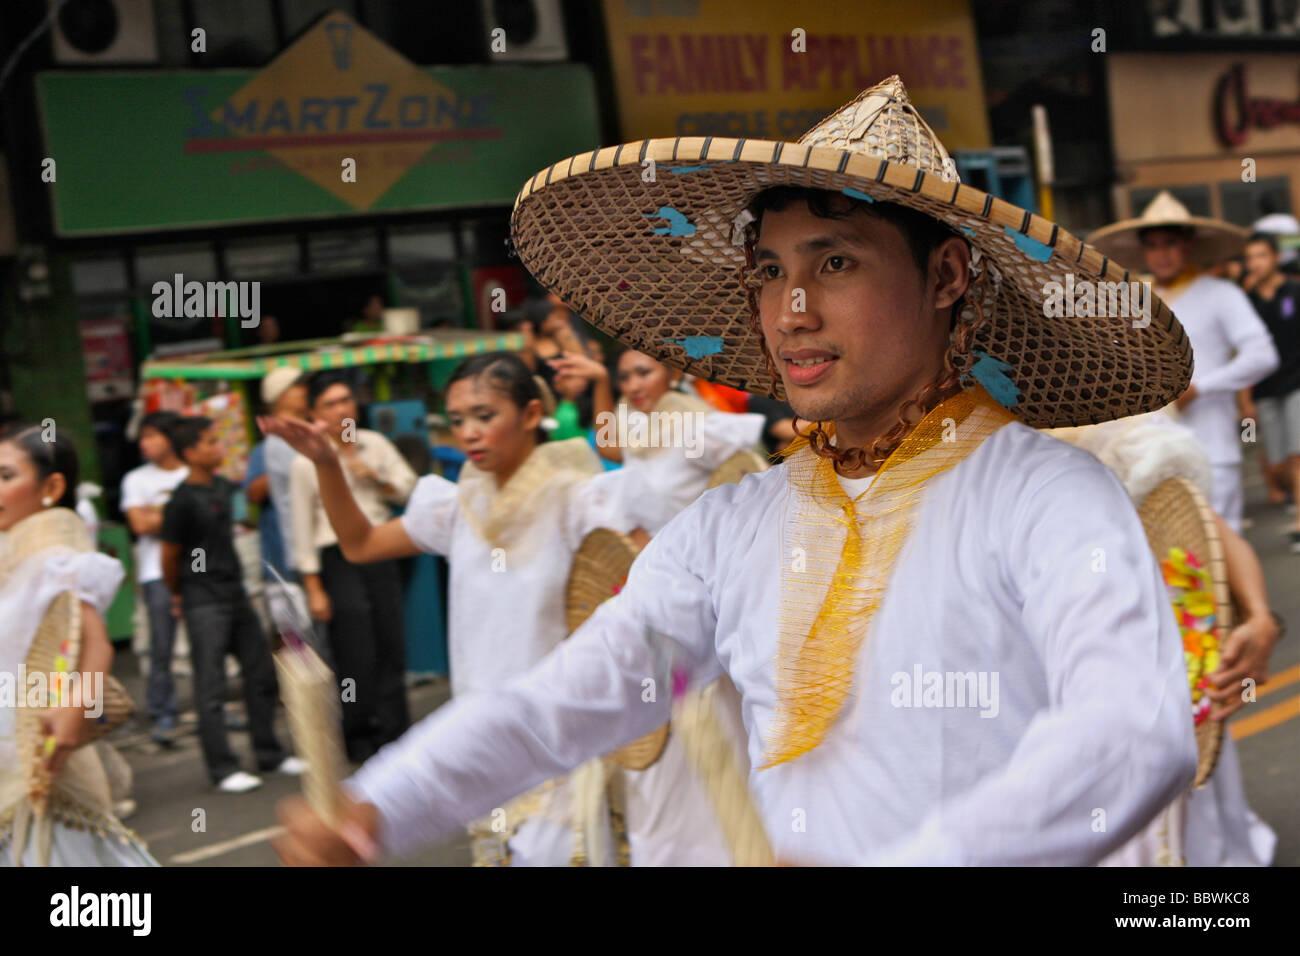 man with sinulog costume on the sinulog festival